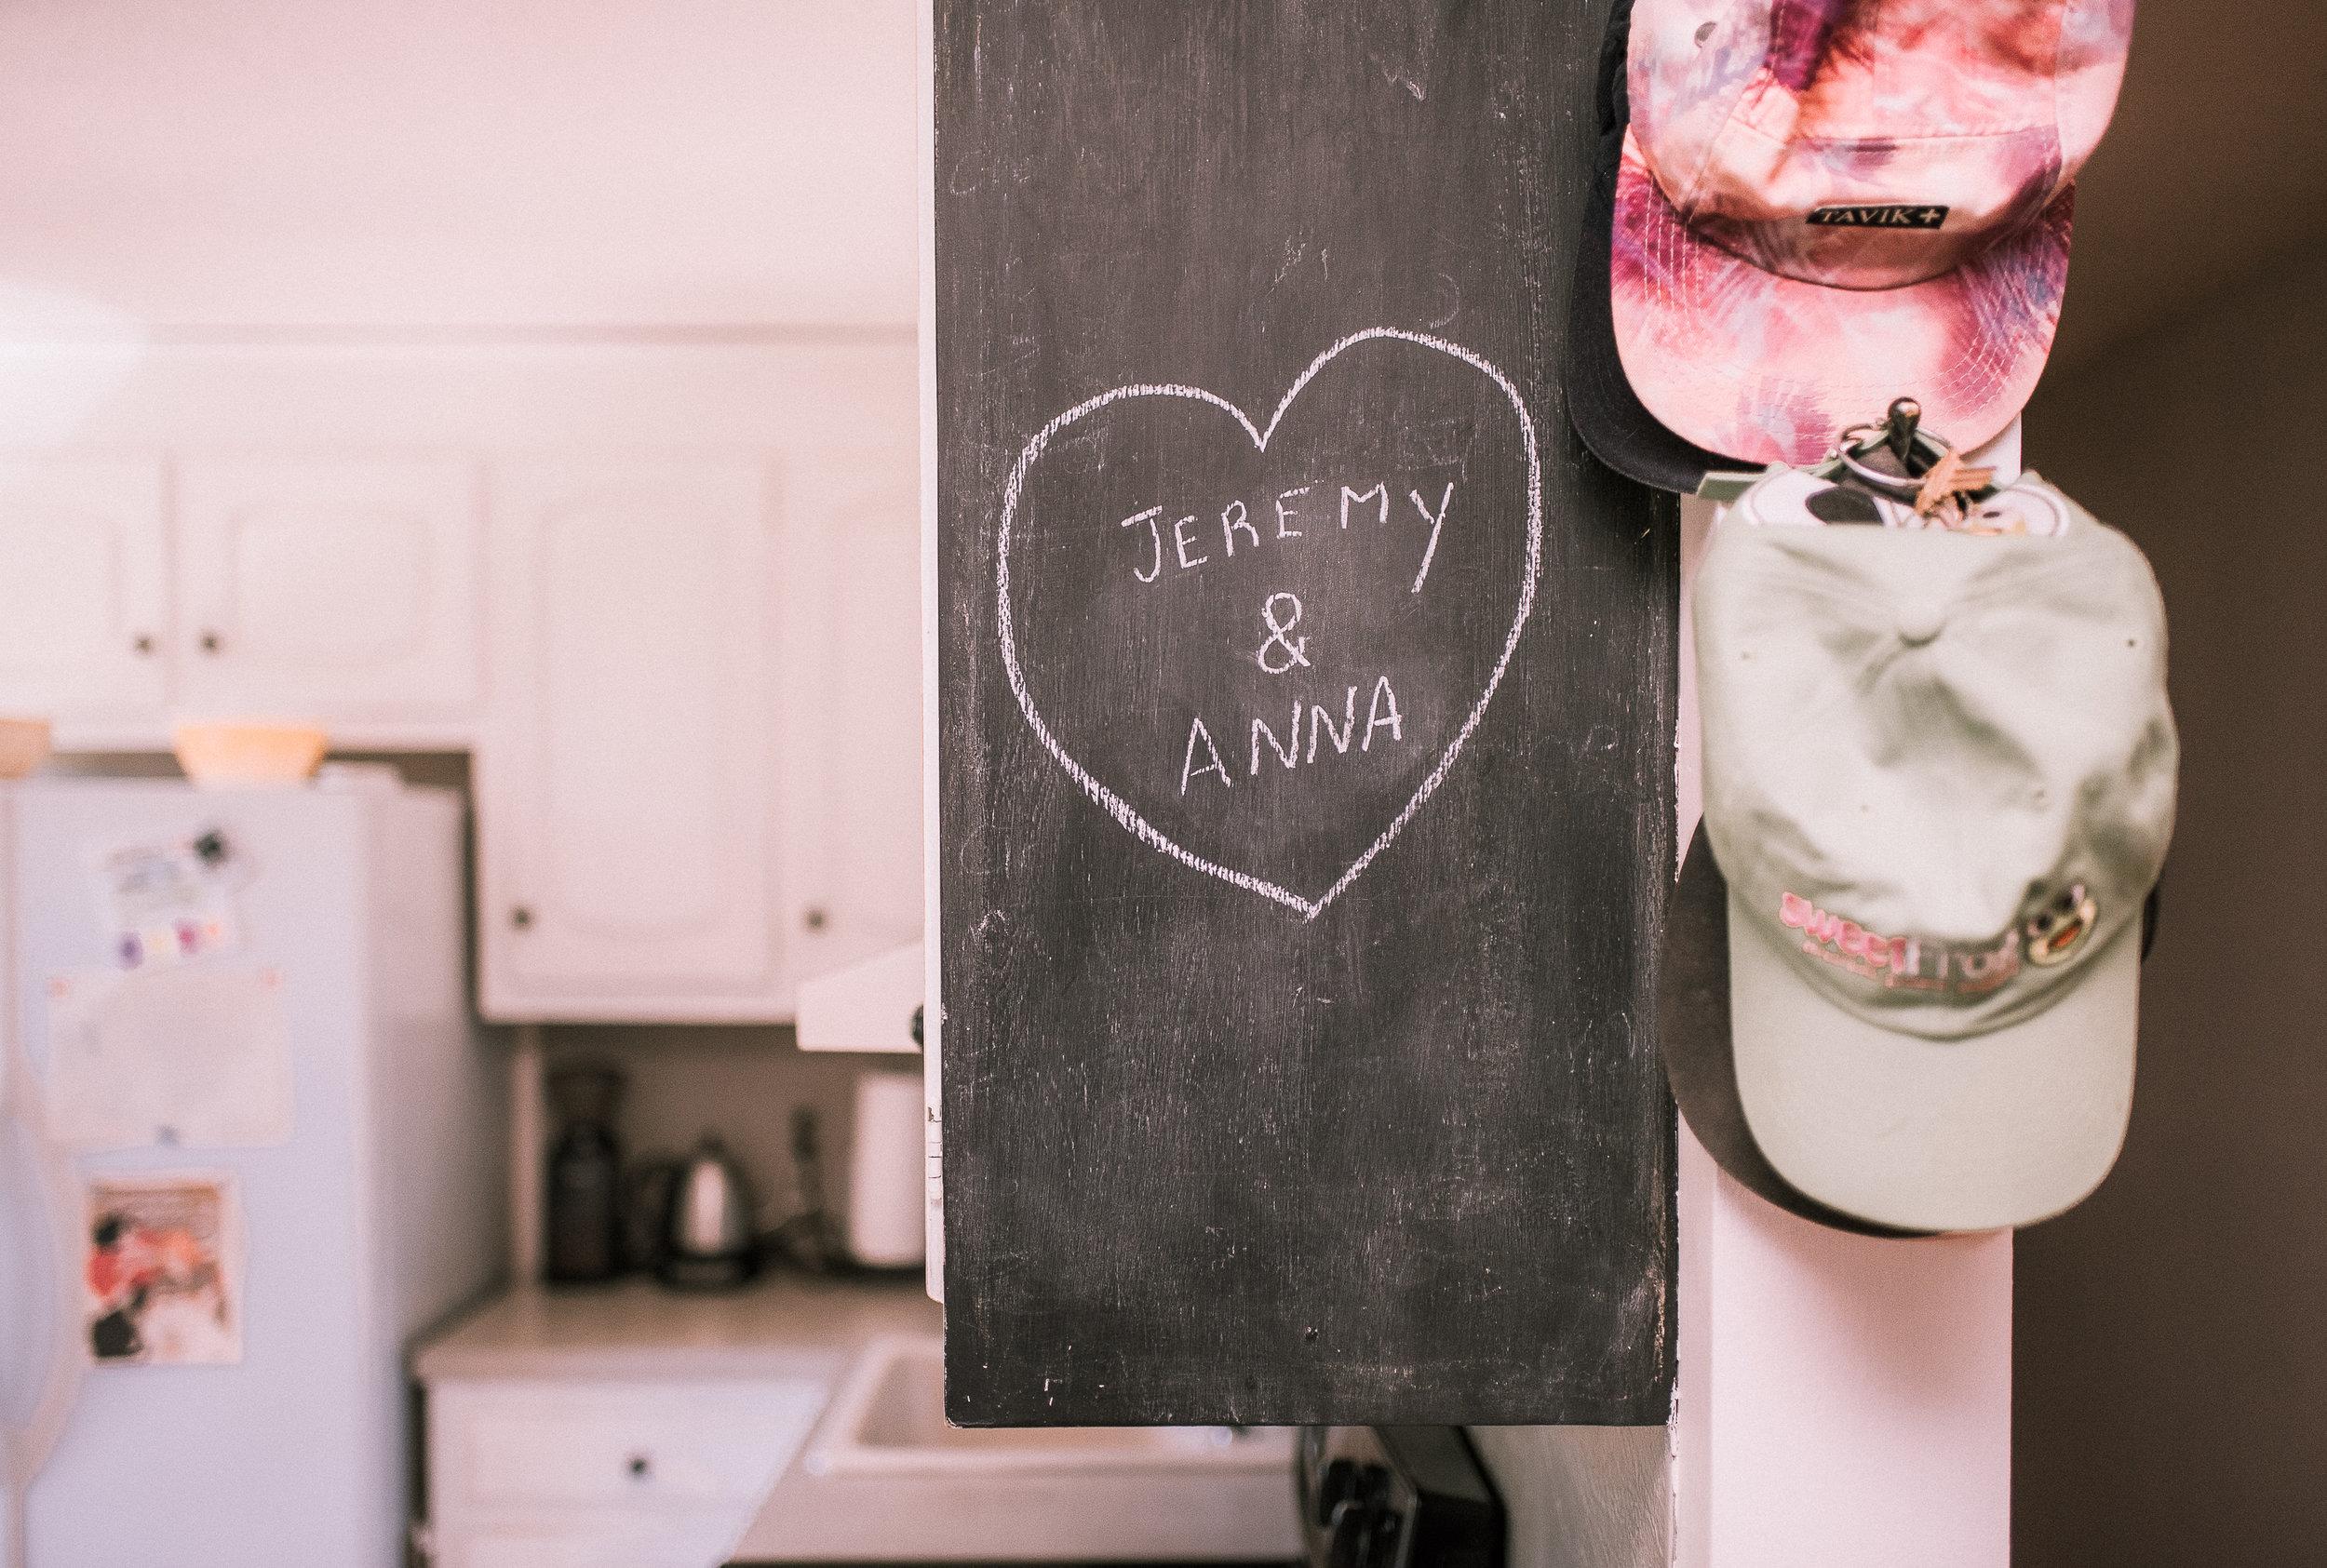 AnnaJeremy-1.jpg